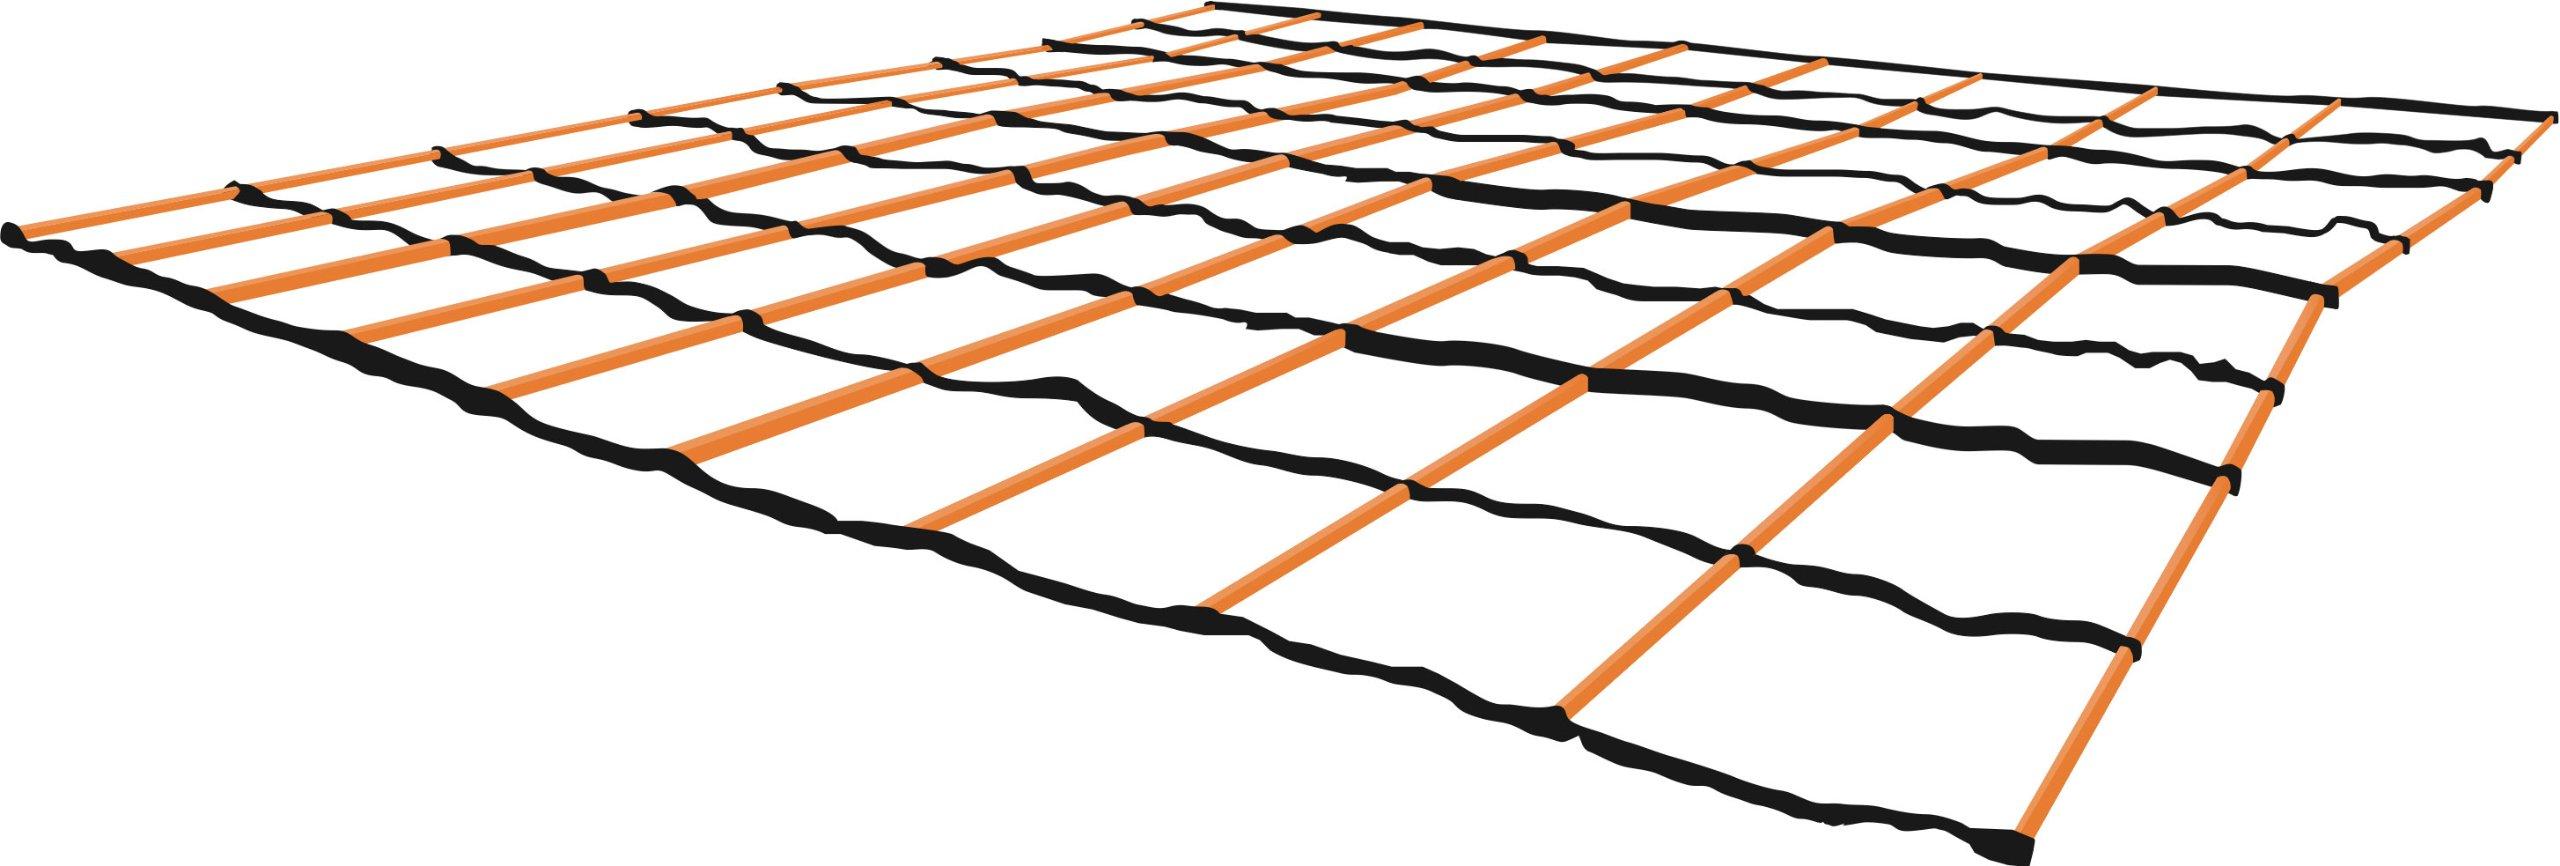 Champion Sports Agility Ladder Training Maze